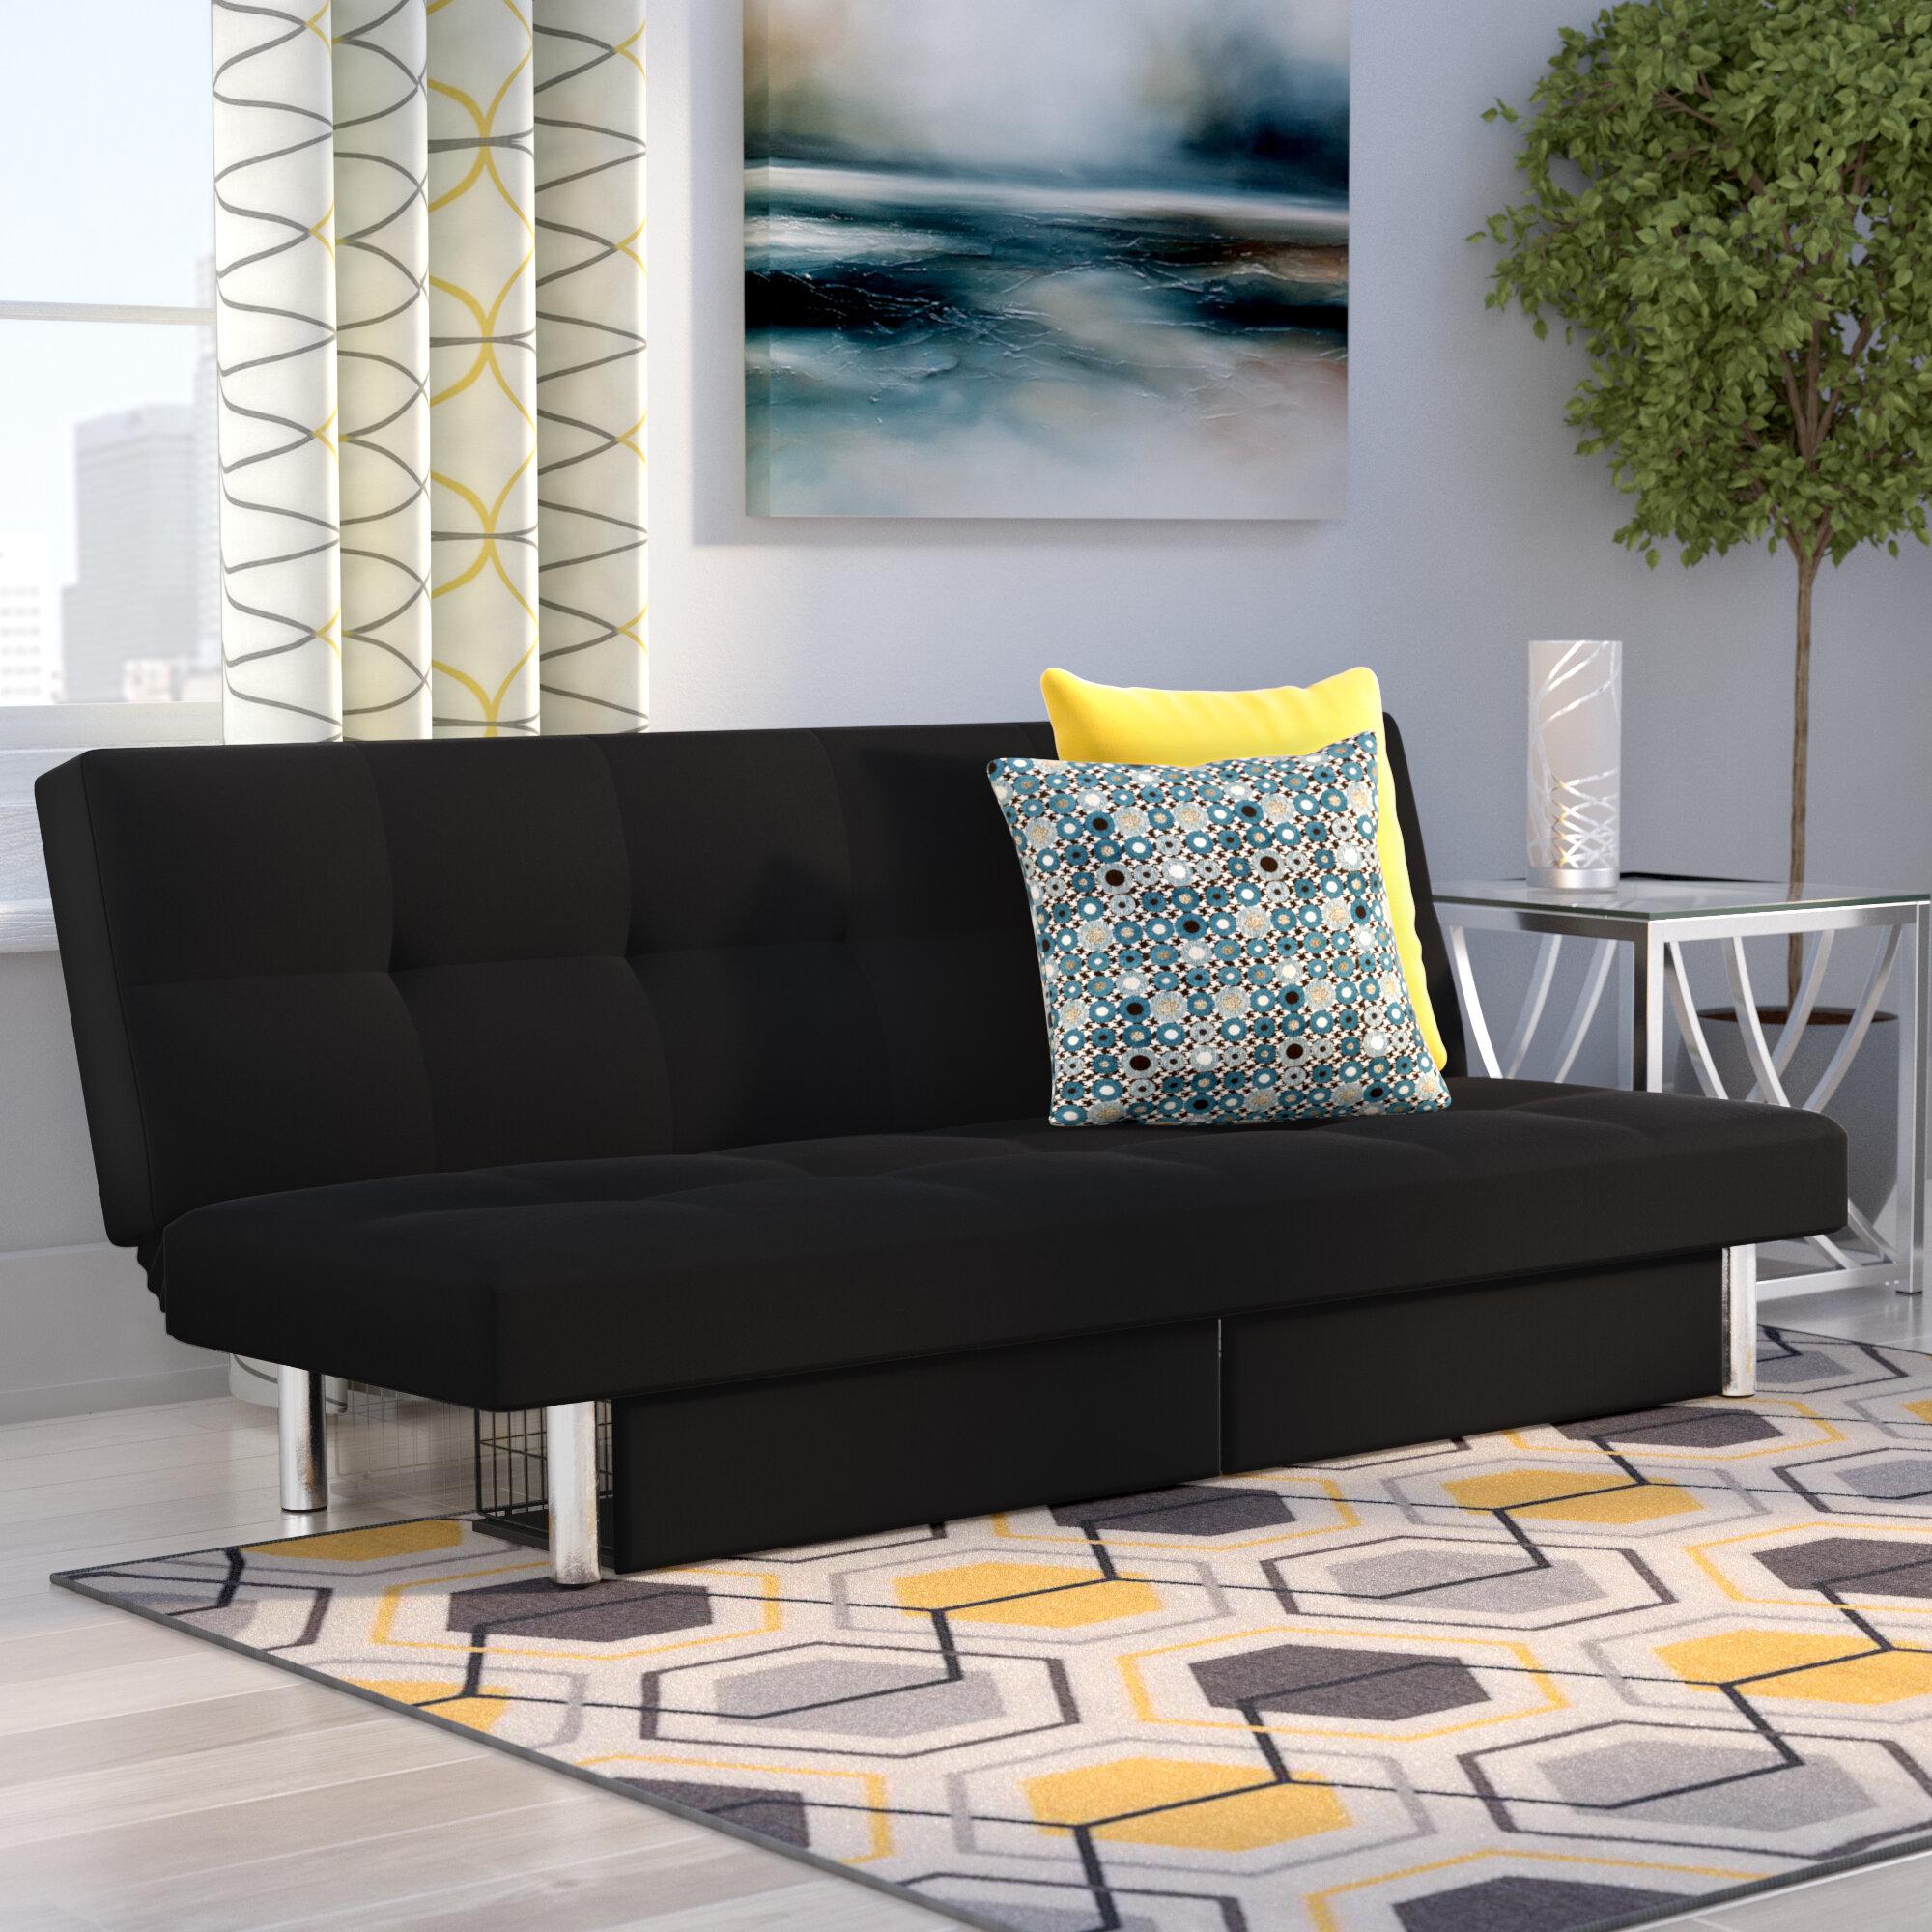 futons company pdx furniture less for memory futon reviews dual mattress foam wayfair mozaic